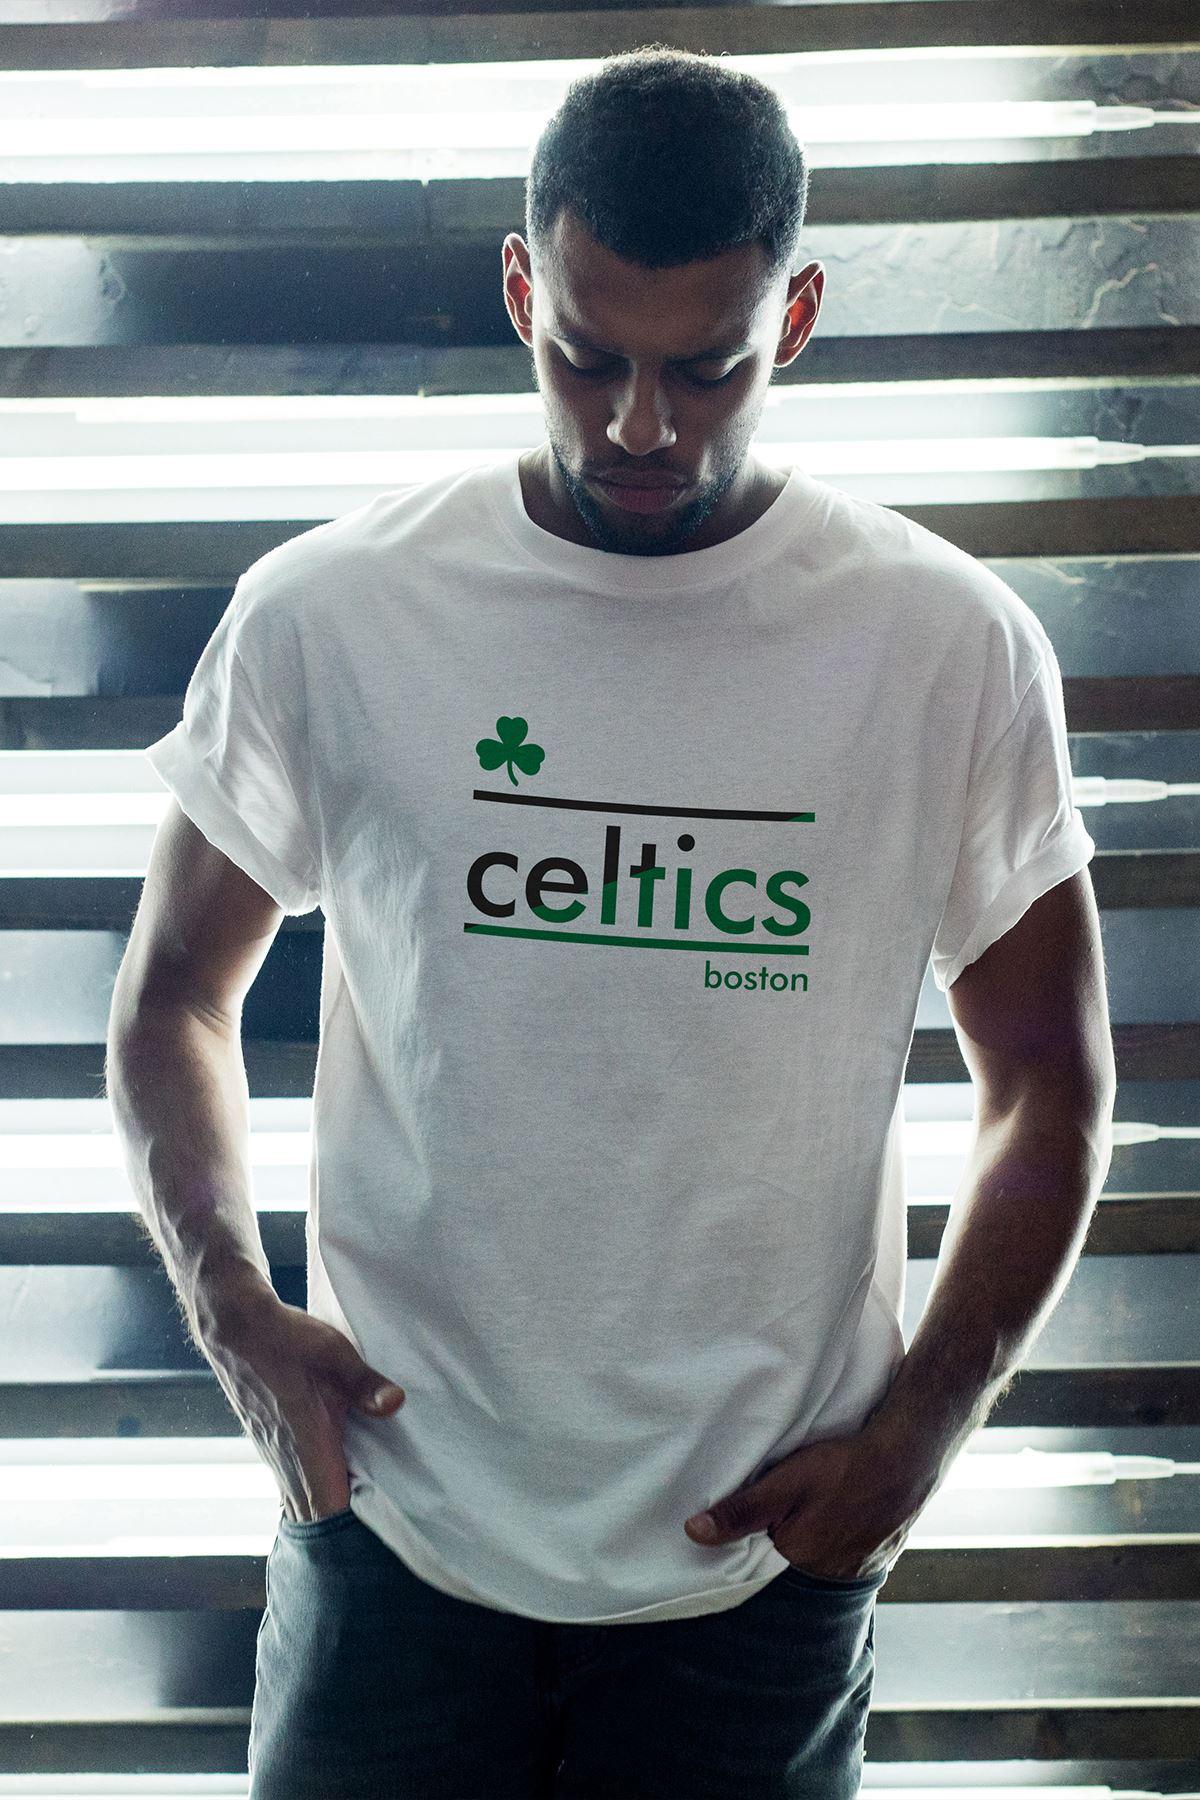 Boston Celtics 25 Beyaz Erkek Oversize Tshirt - Tişört